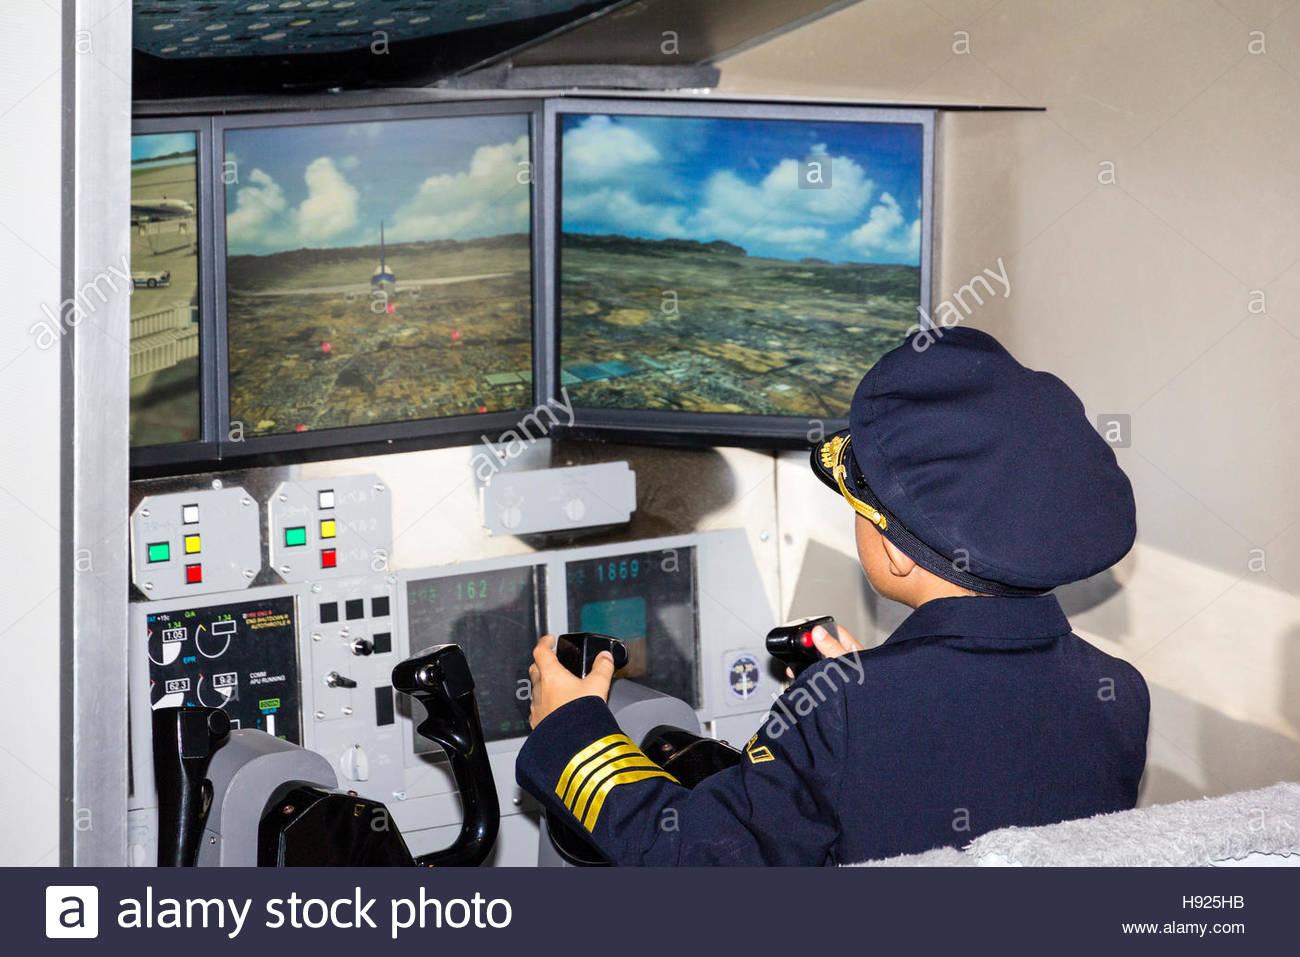 Click image for larger version.  Name:japan-nishinomiya-kidzania-ana-flight-simulators-with-boy-child-in-H925HB.jpg Views:26 Size:151.8 KB ID:25492